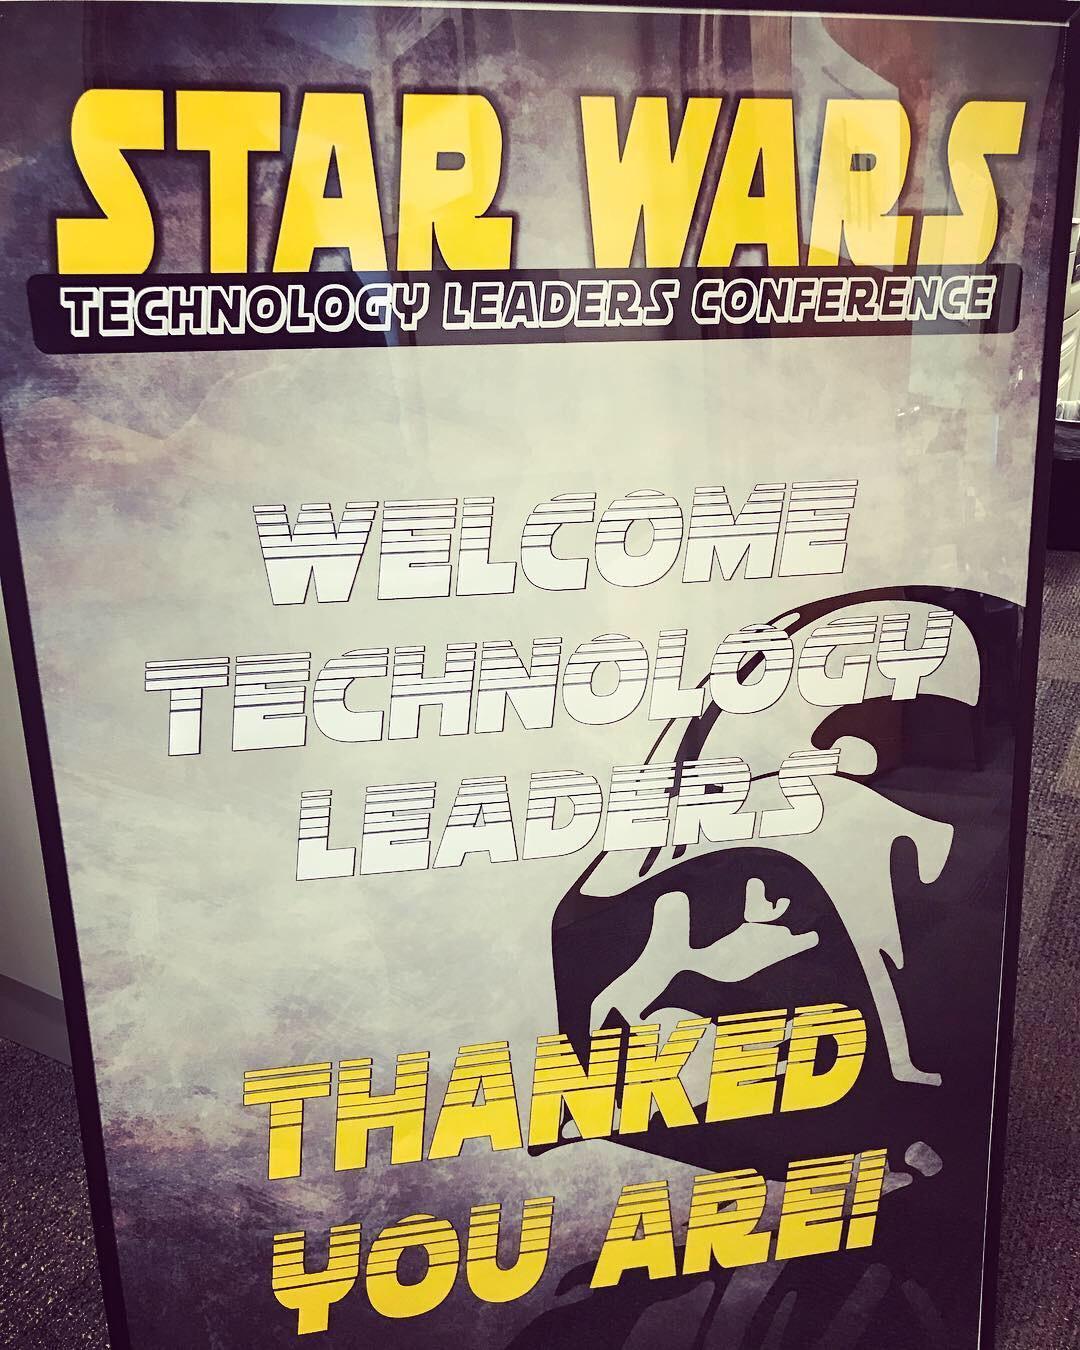 May 2, 2019 Star Wars Themed Meeting